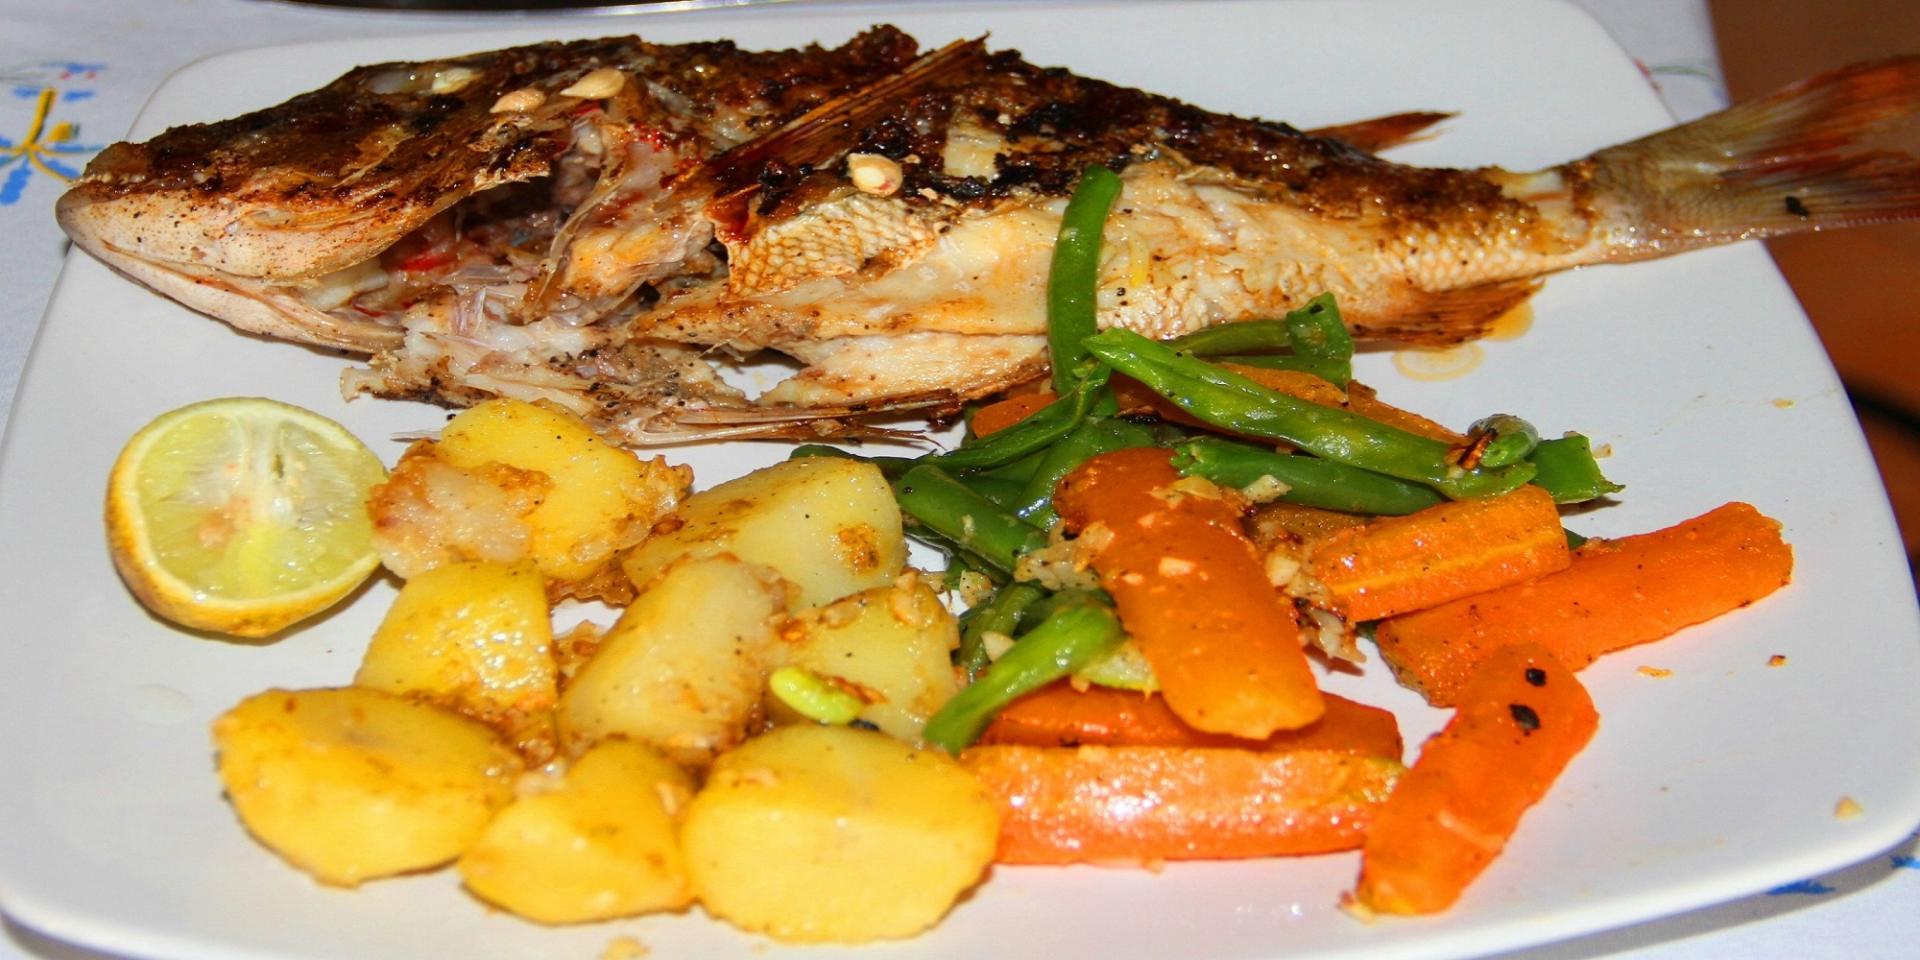 Lakana h tel - Restaurant poisson grille paris ...